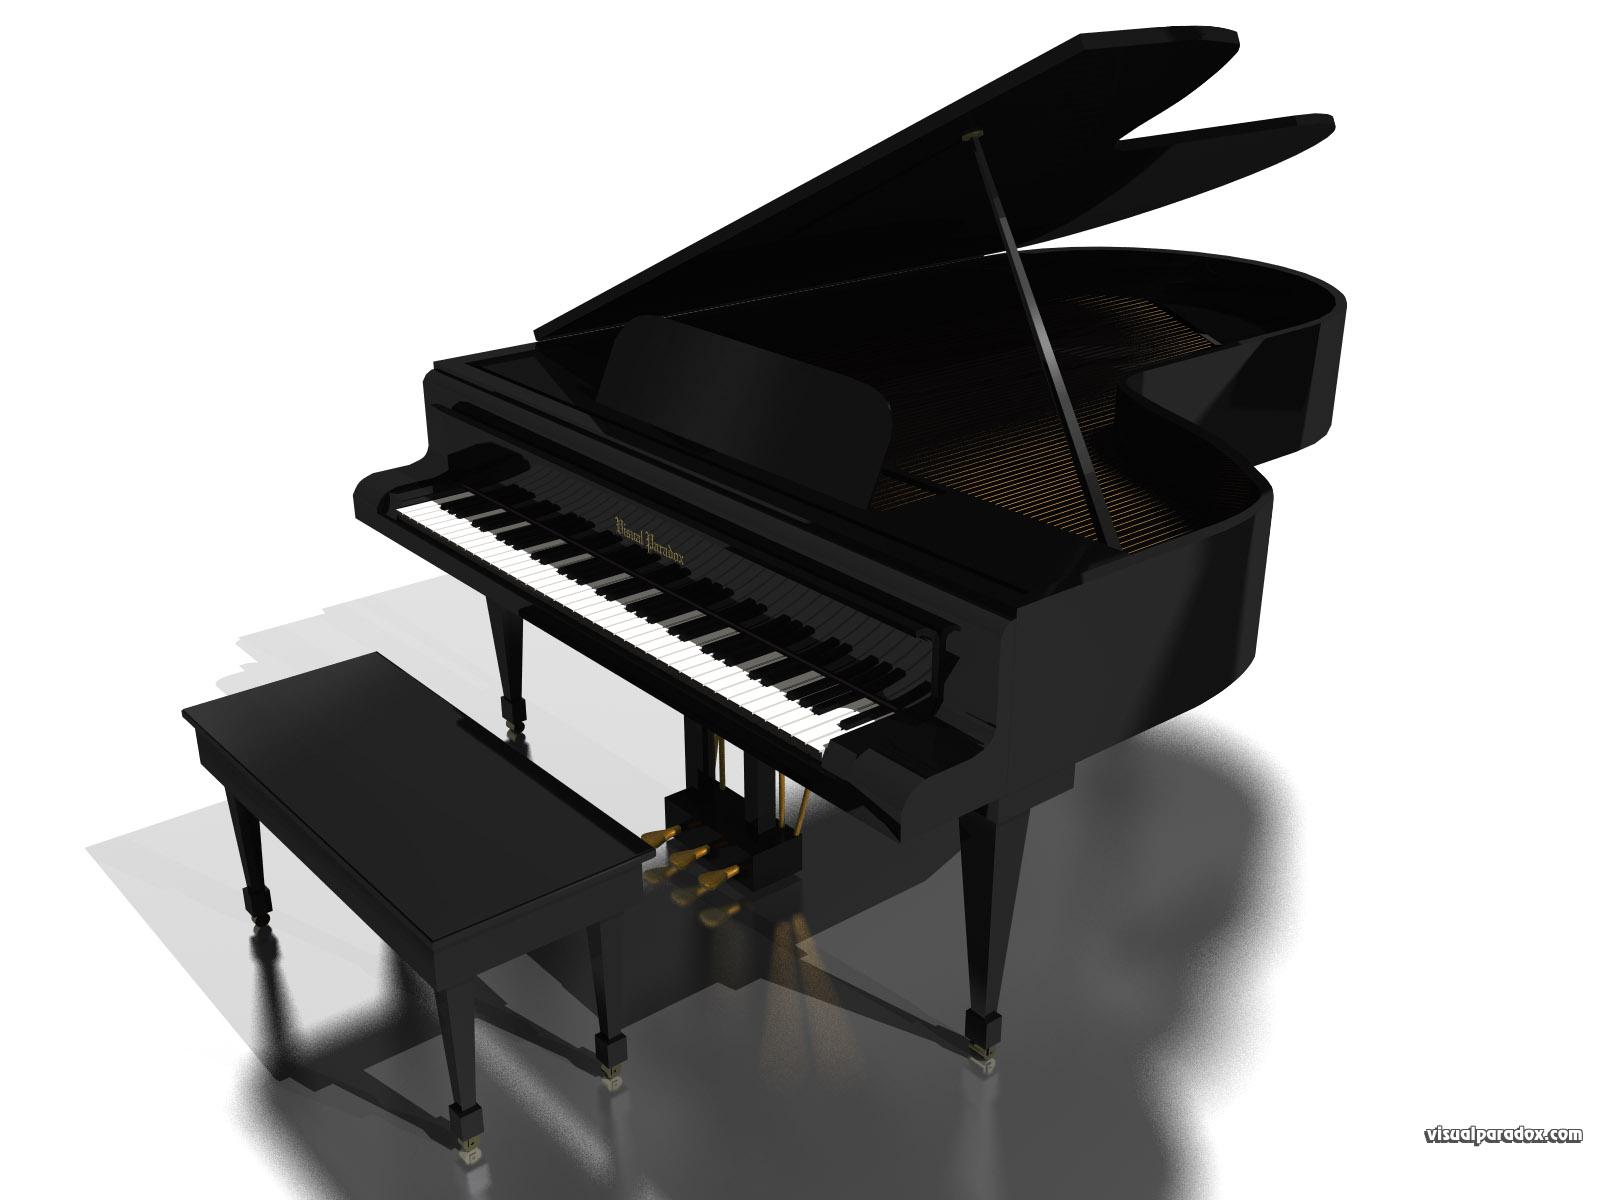 Free 3D Wallpaper 'Grand Piano' 1600x1200